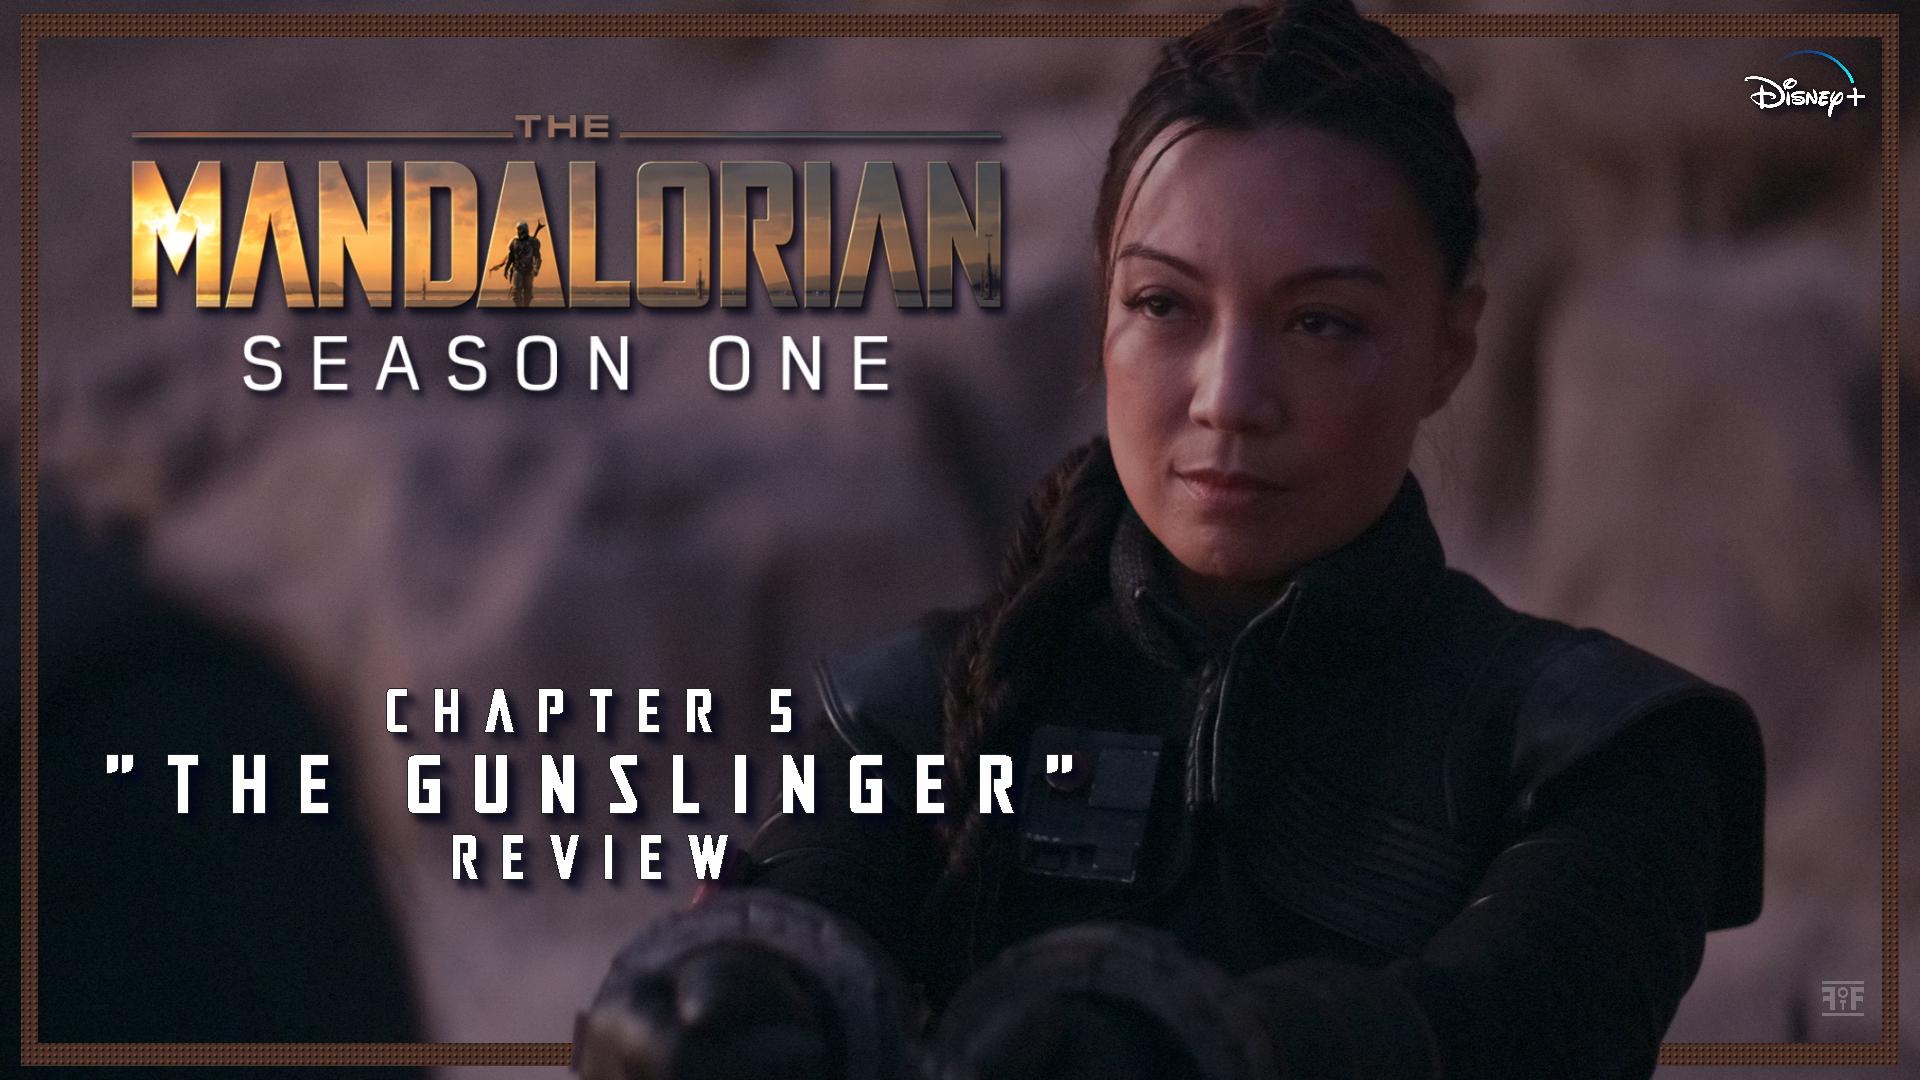 The Mandalorian: Chapter 5 'The Gunslinger' Review